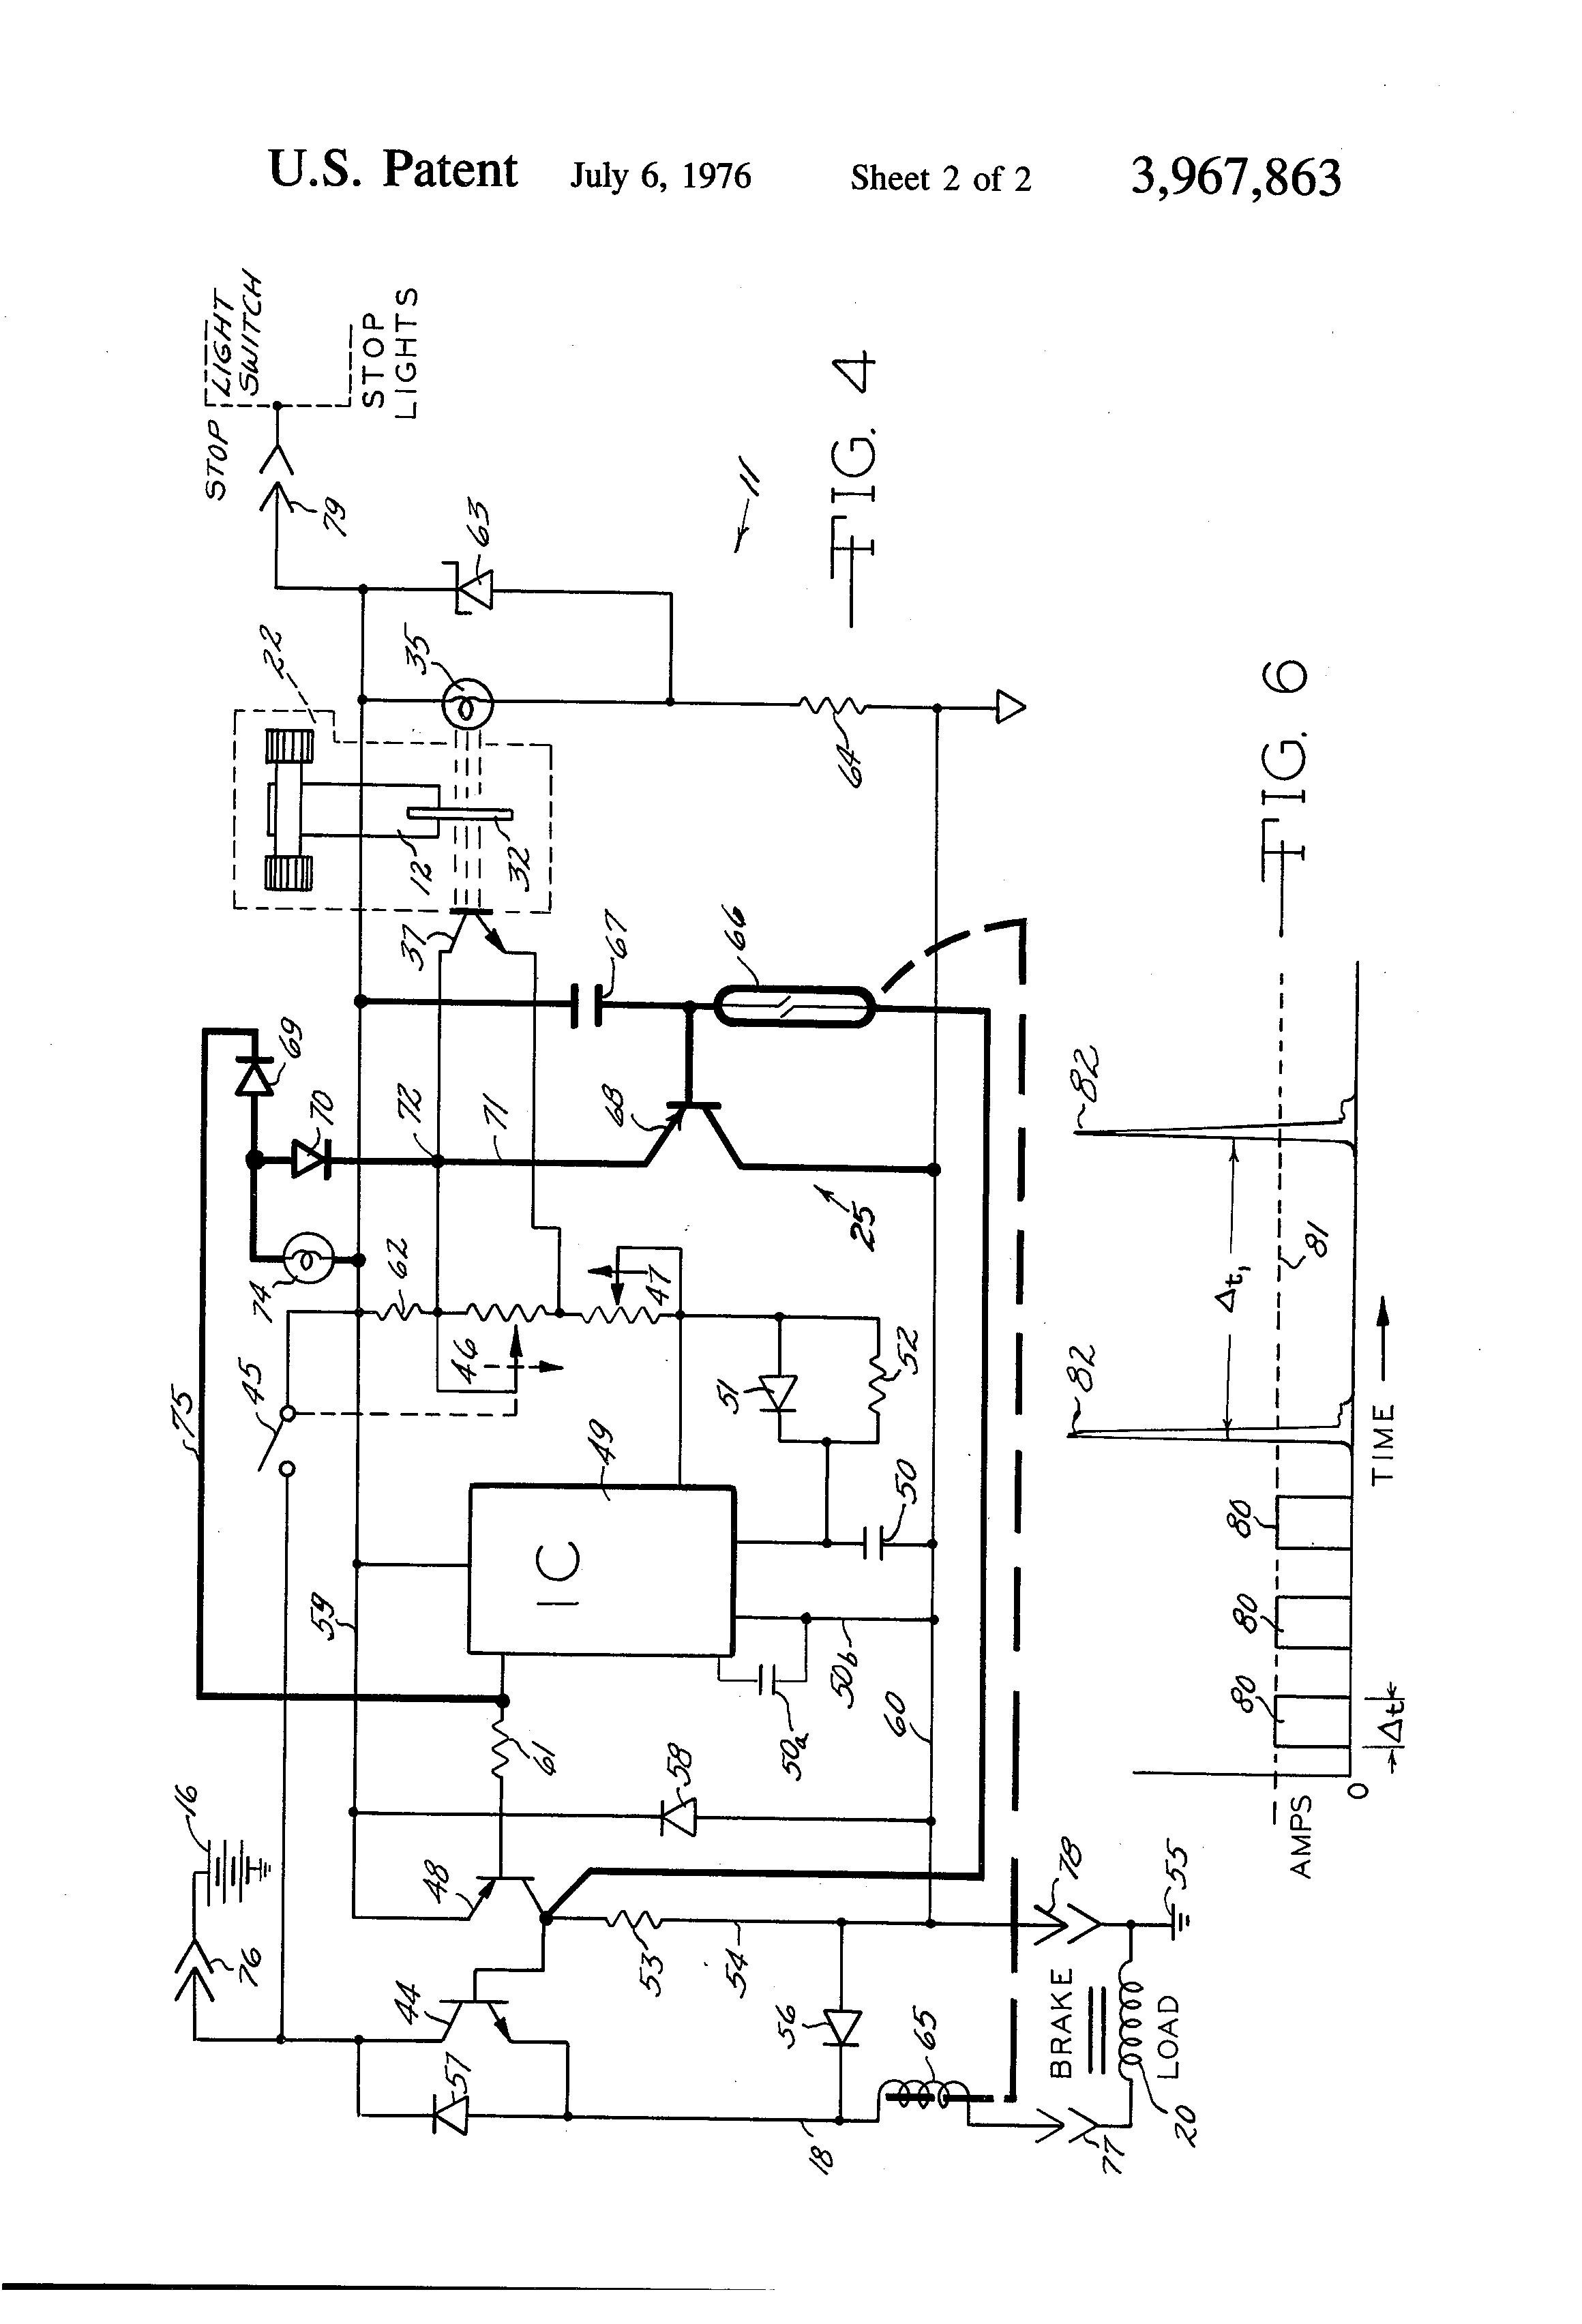 Tekonsha Voyager Brake Controller Wiring Diagram Primus Iq P2 Control Symbols Residential Electrical